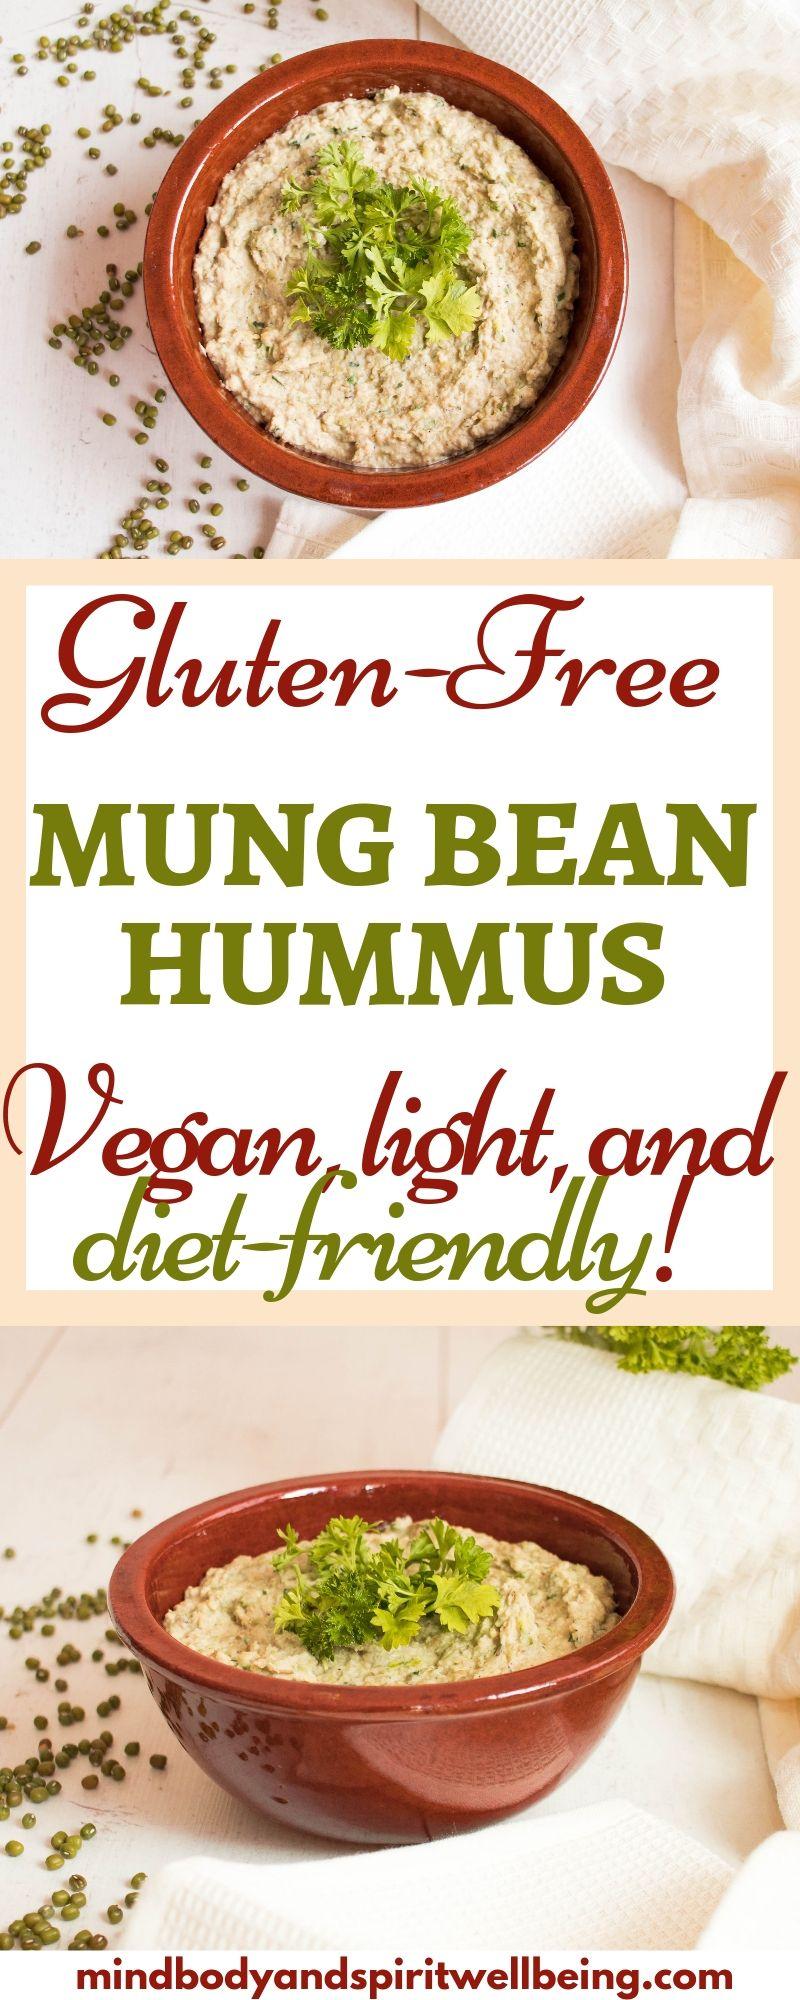 Mung Bean Hummus